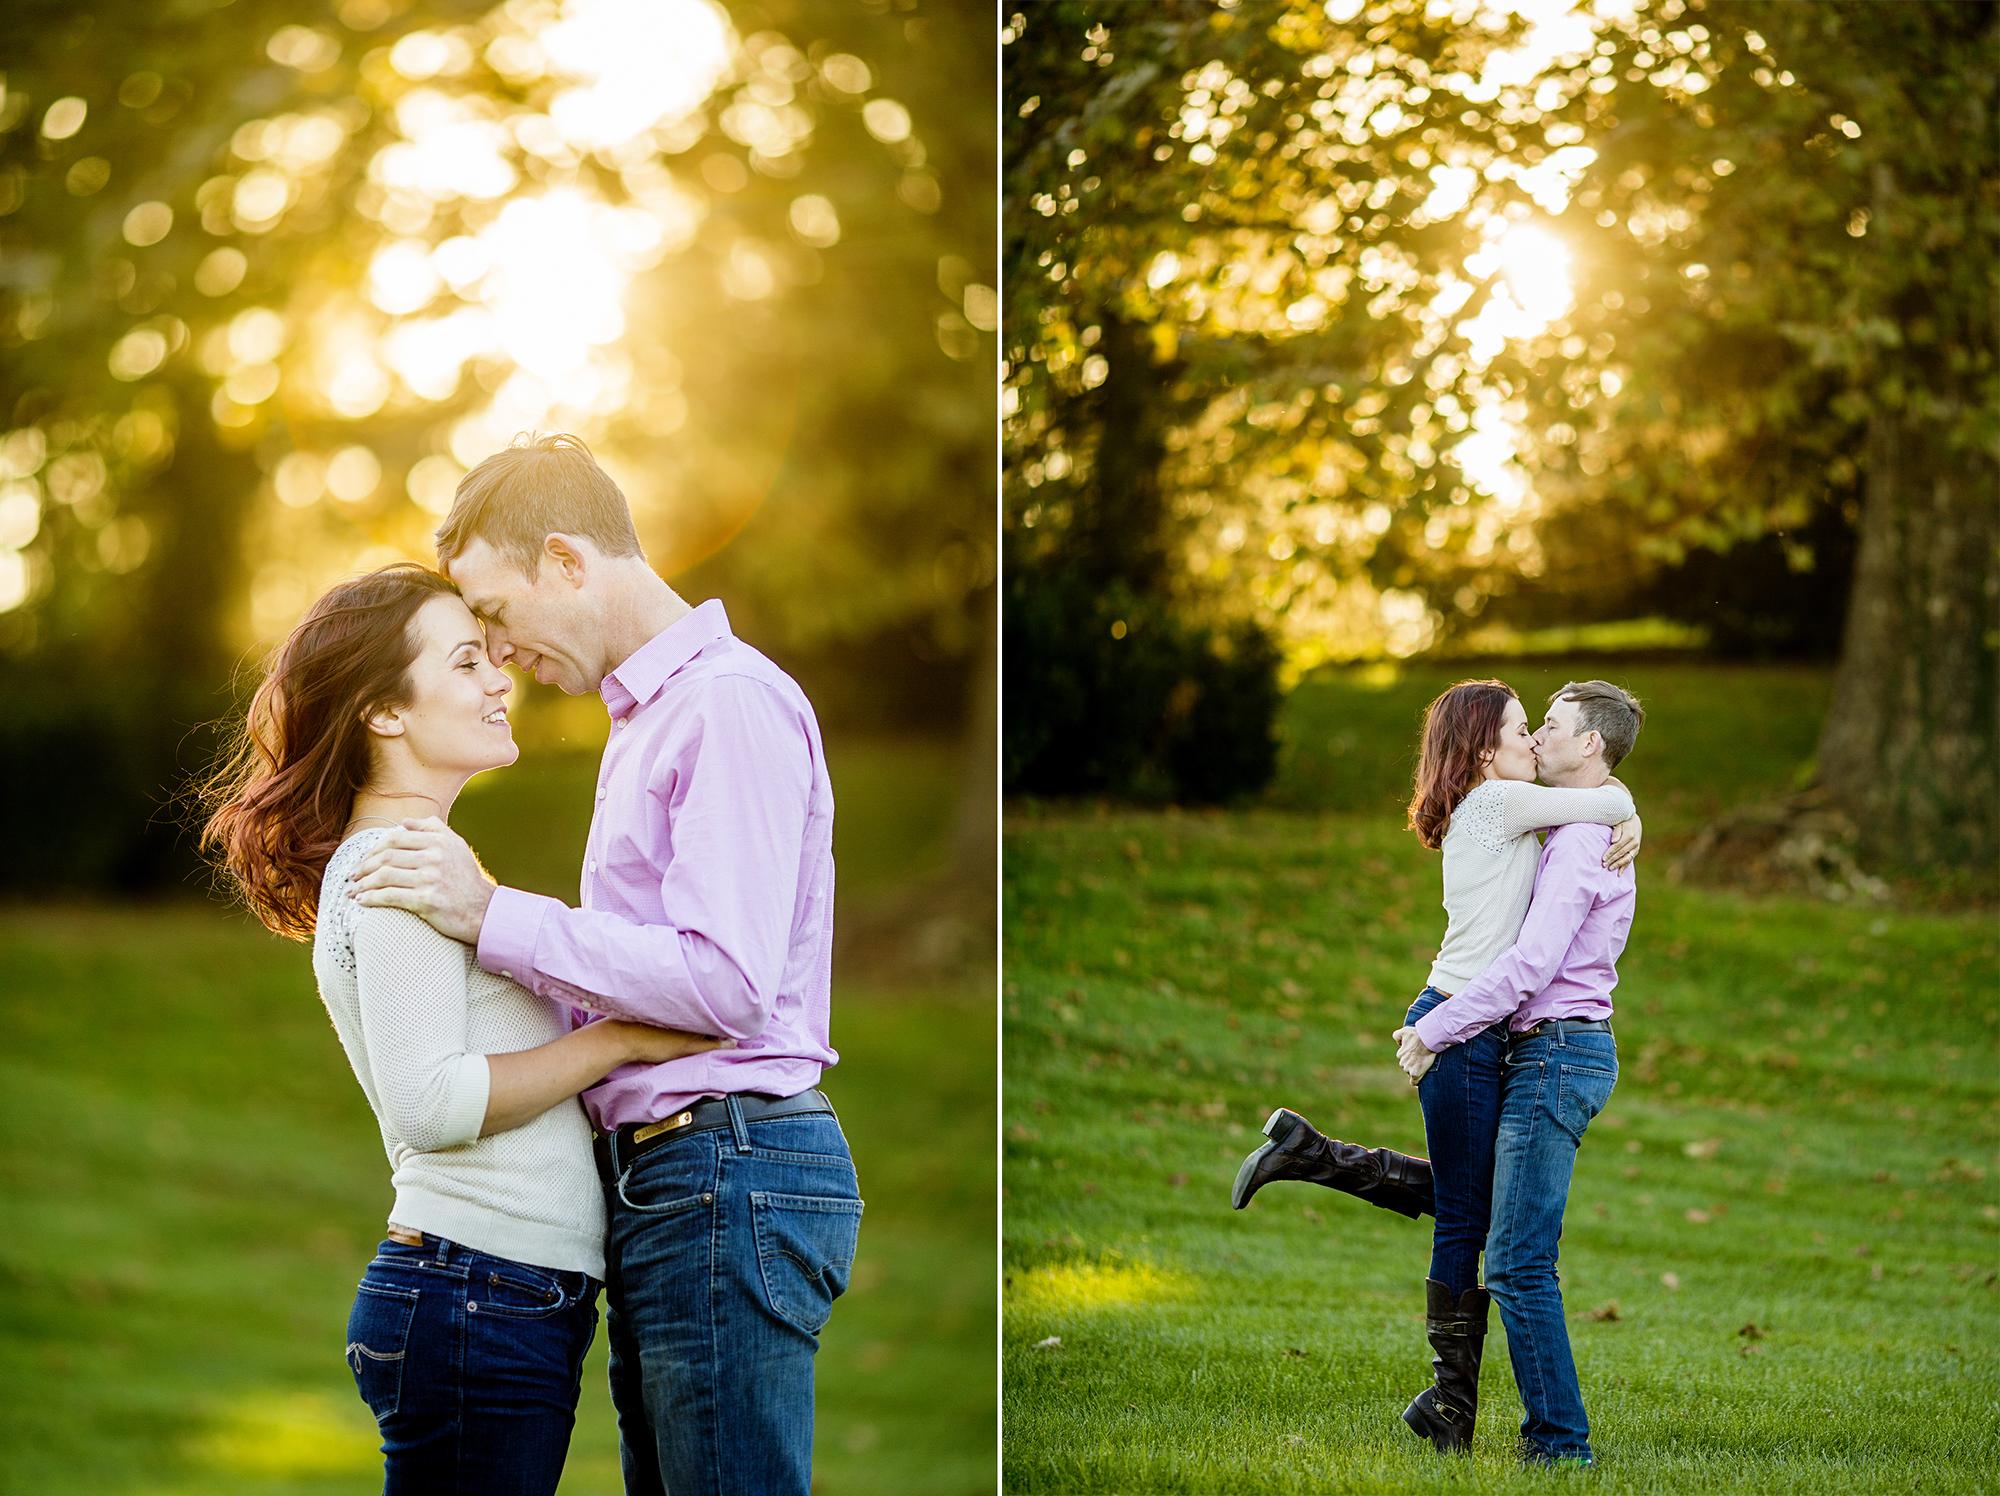 Seriously_Sabrina_Photography_Lexington_Kentucky_Burl_Winstar_Farm_Engagement_AliJerry_28.jpg